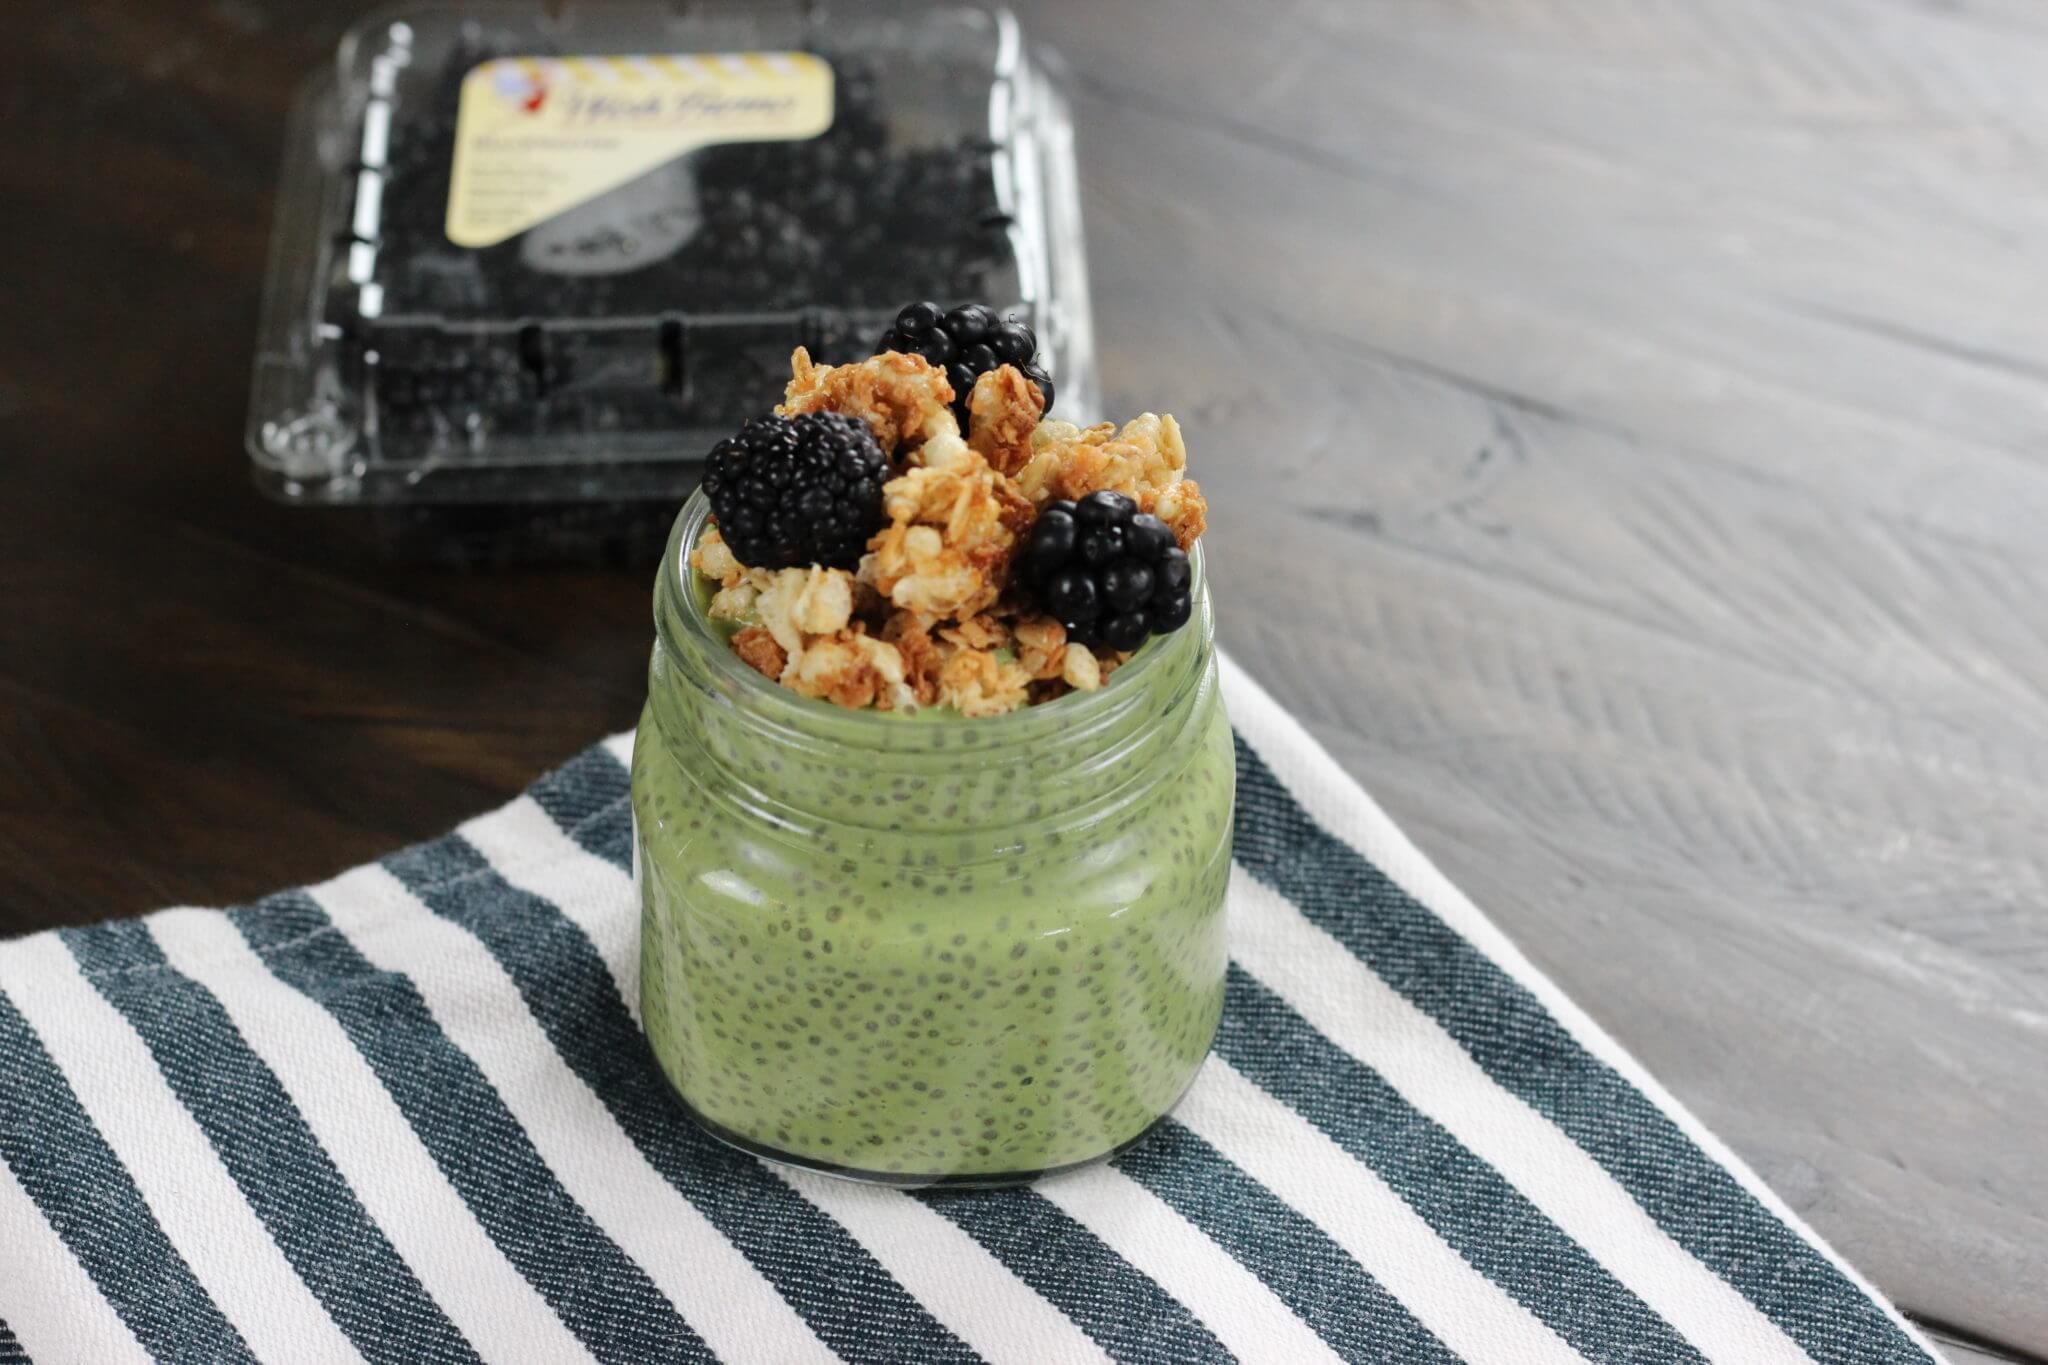 Blackberry Matcha Chia Seed Pudding